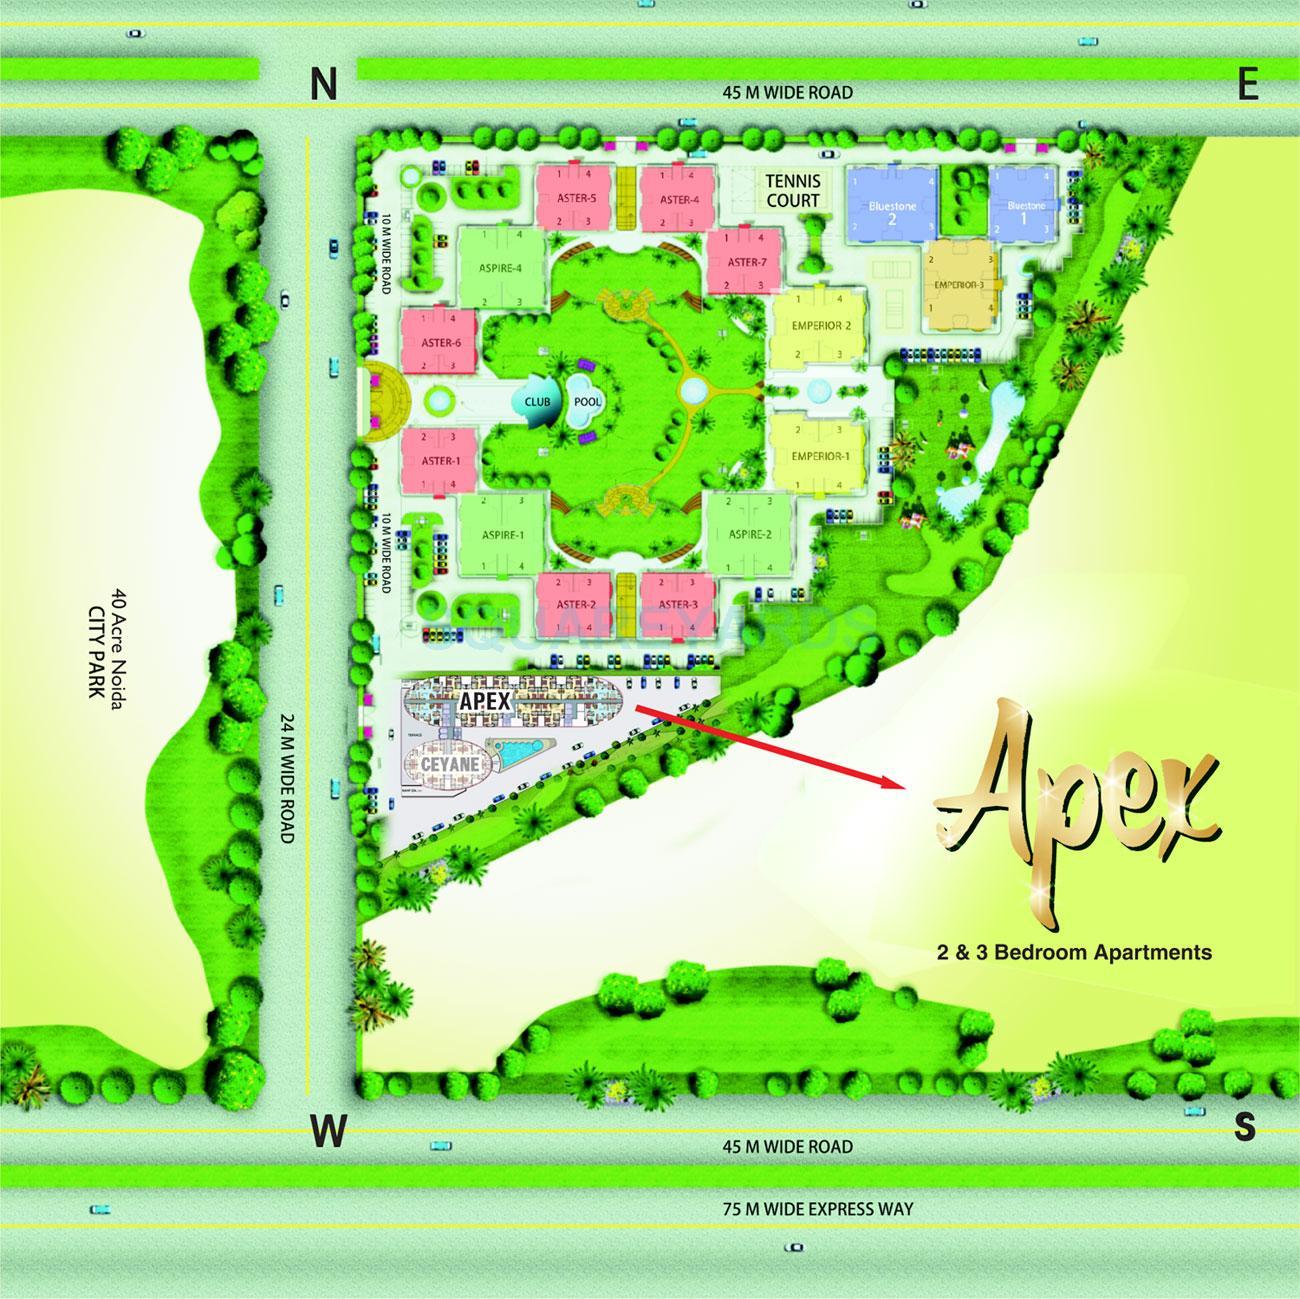 supertech apex tower master plan image1